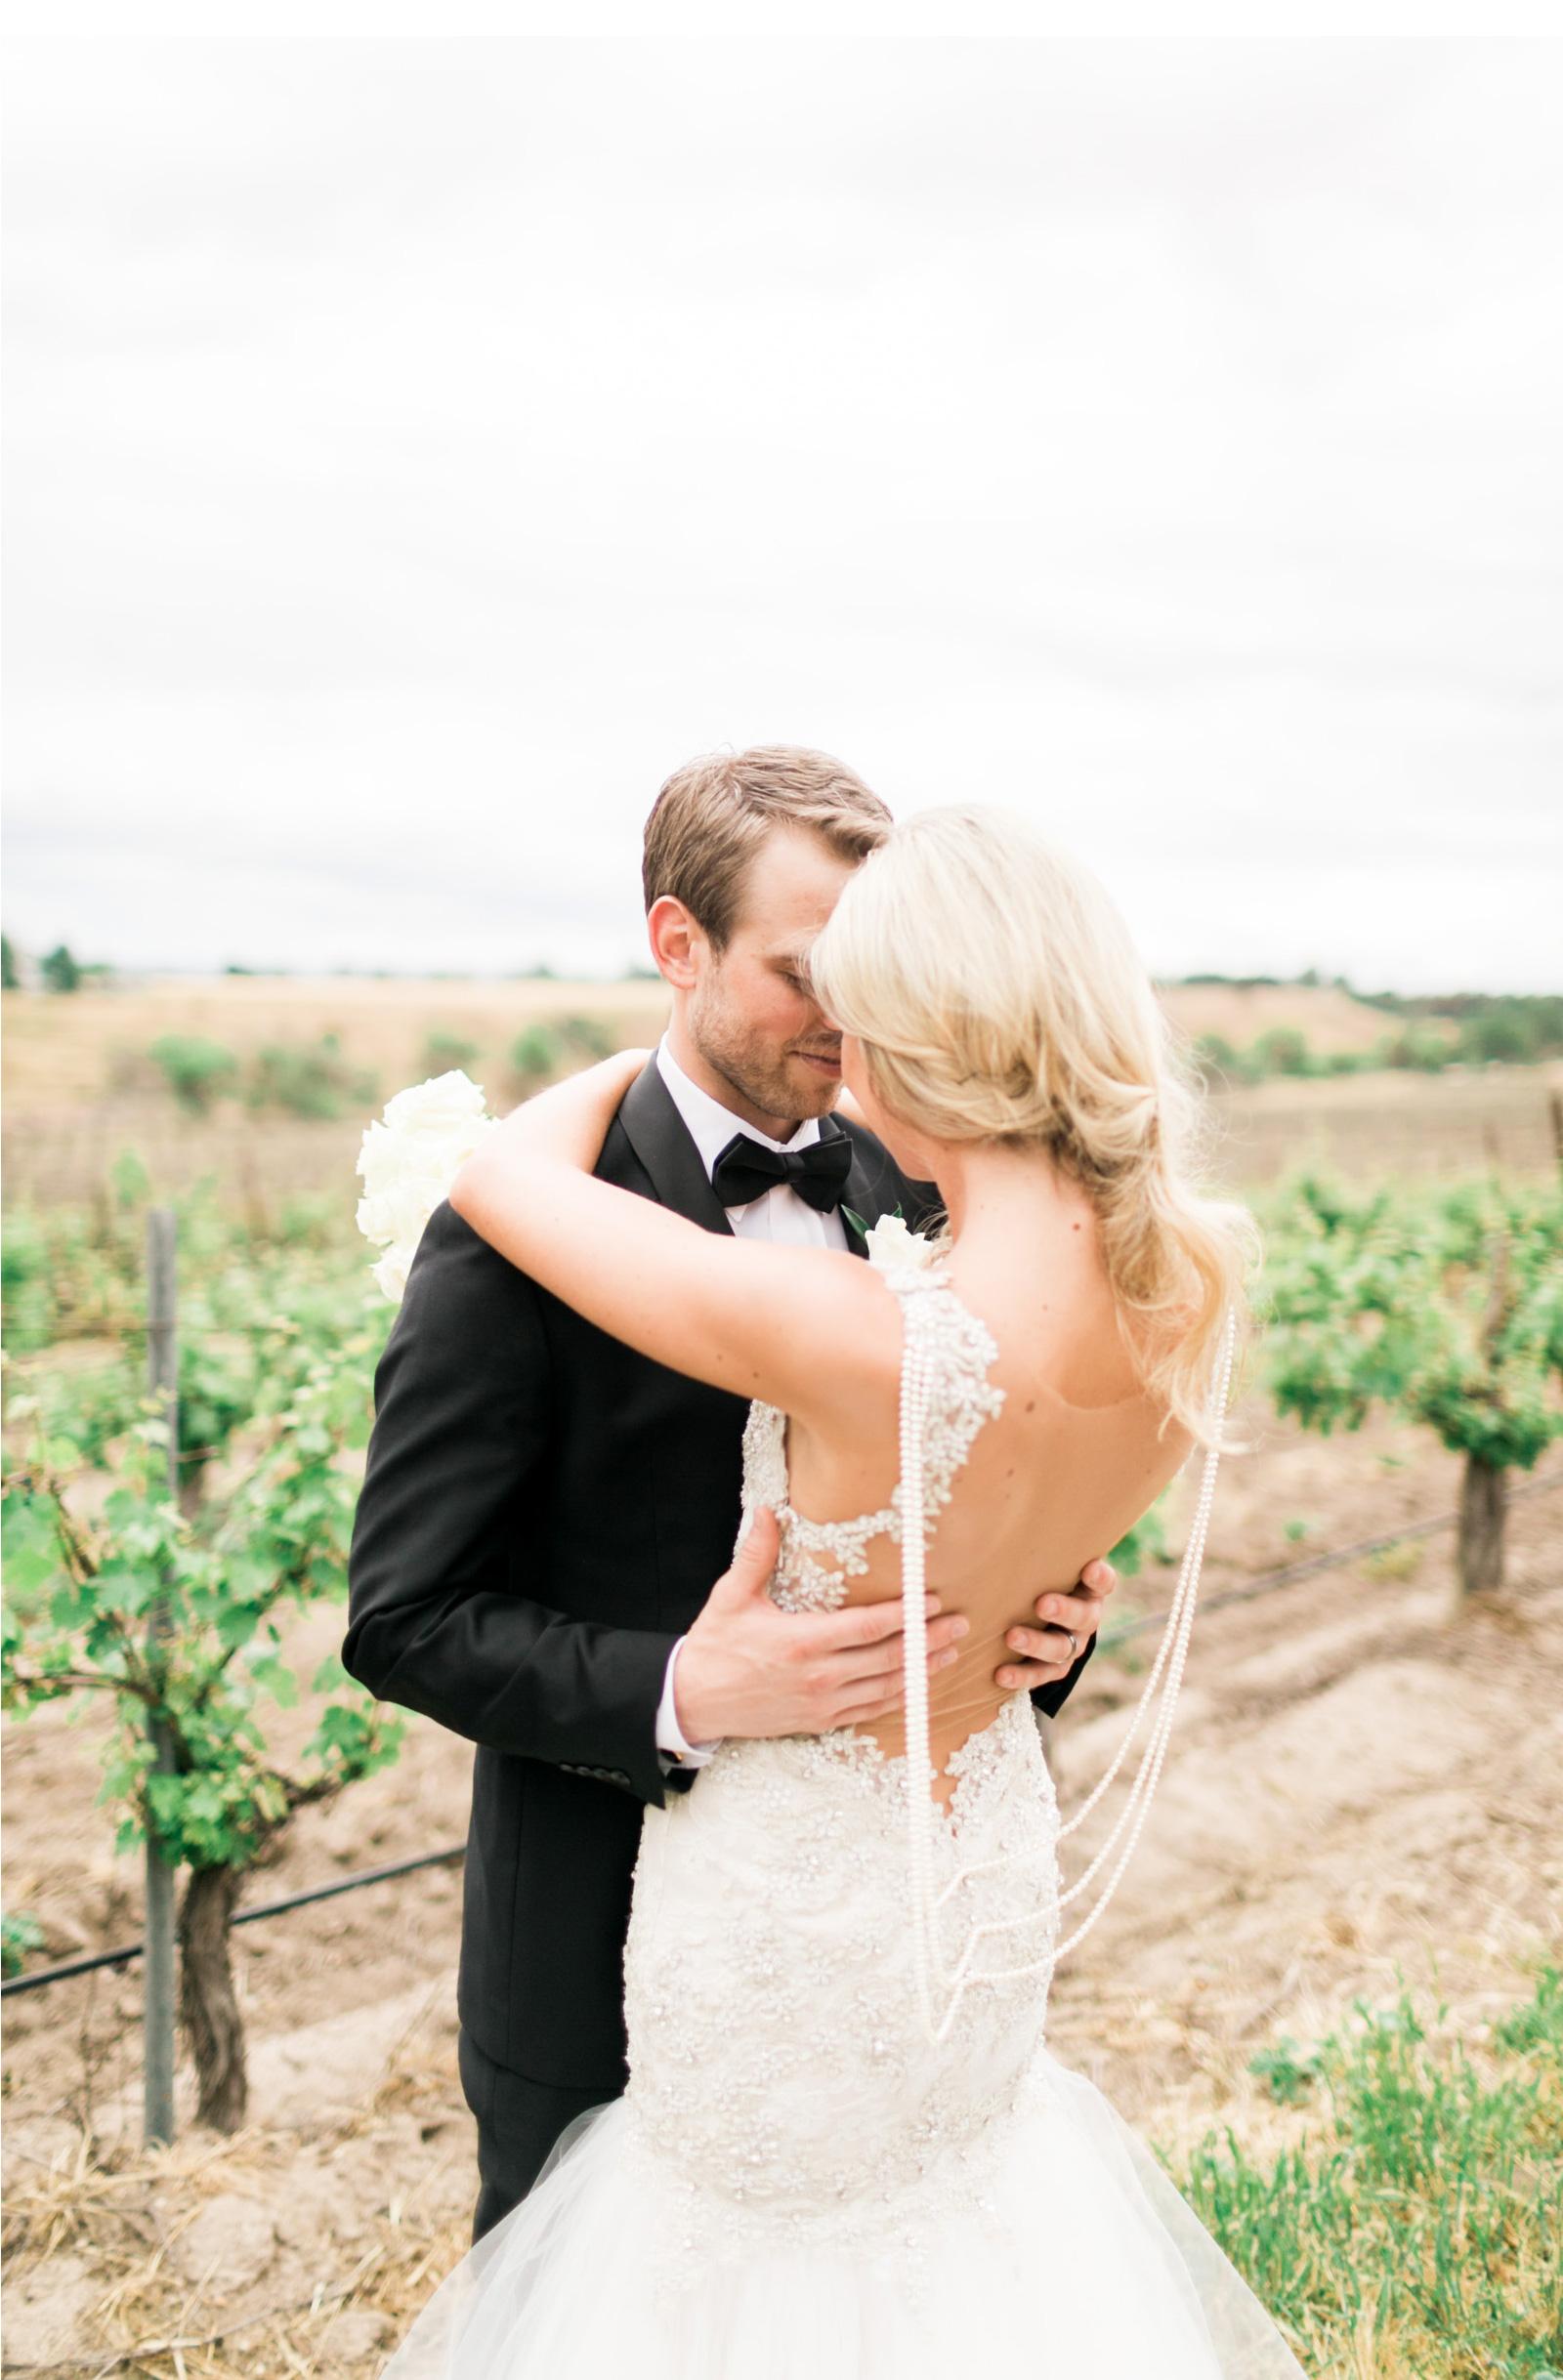 Style-Me-Pretty-Vineyard-Wedding-Natalie-Schutt-Photography_12.jpg